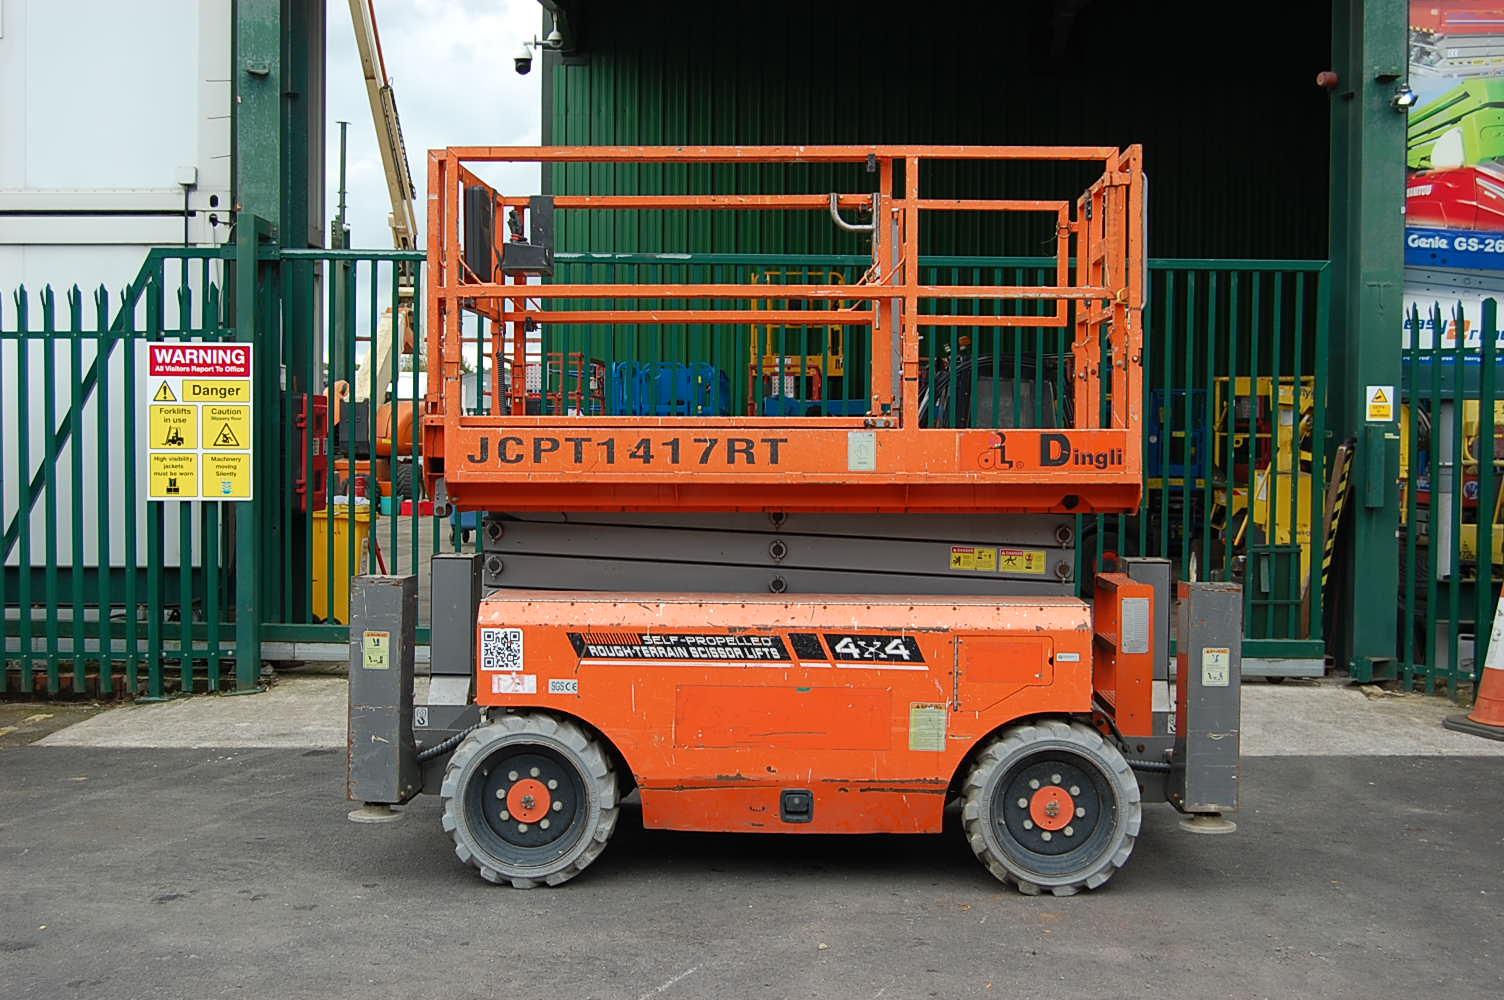 2014 Dingli JCPT1417RT Diesel 4×4 Scissor Lift 14m